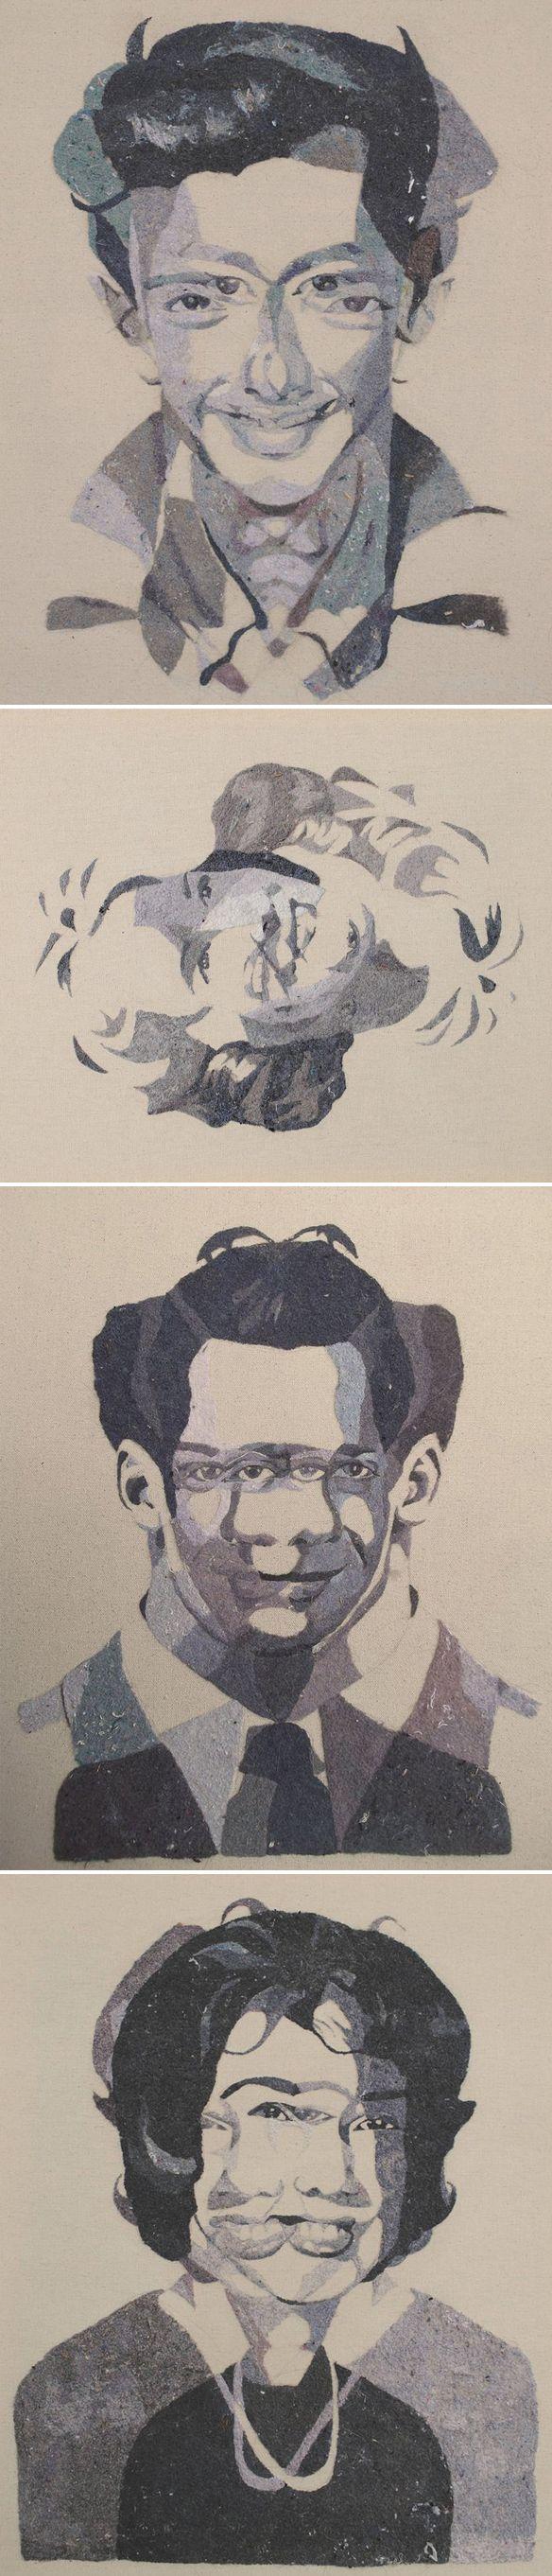 portraits by tonya corkey... made from LINT! yep, lint on canvas <3